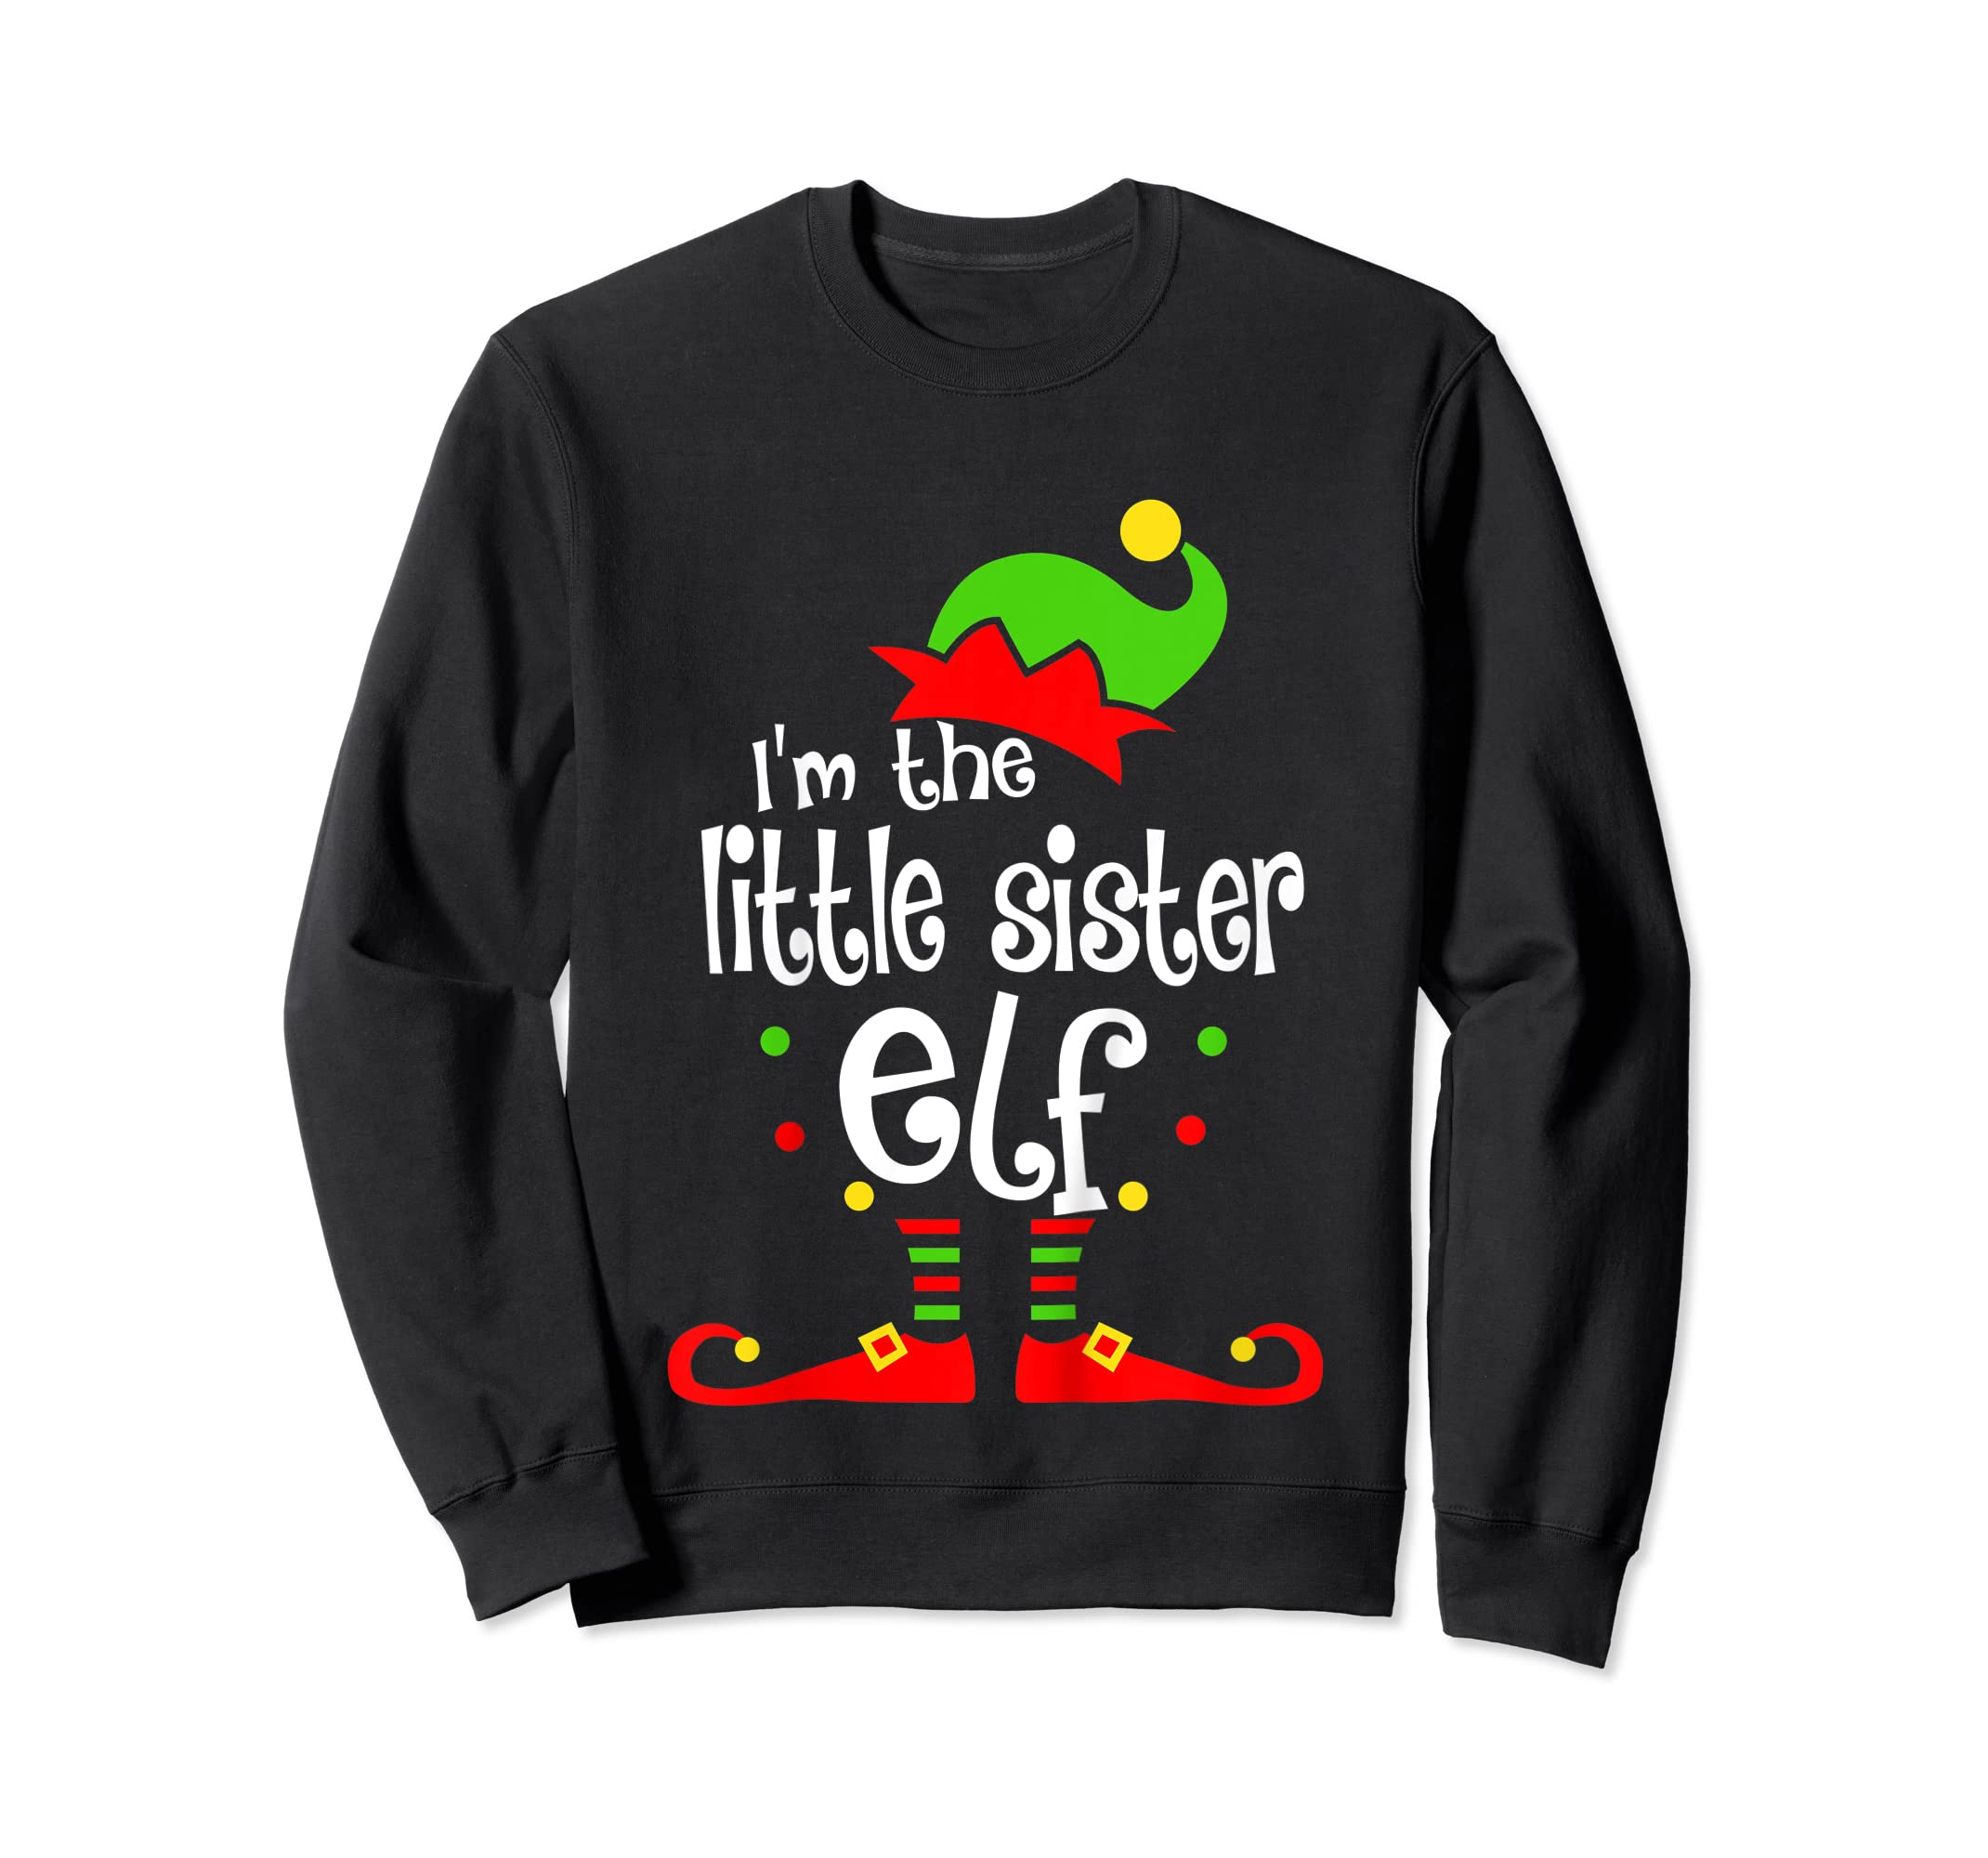 Kids Little Sister Elf Christmas Costume Outfit Xmas Gift T-Shirt-Sweatshirt-Black